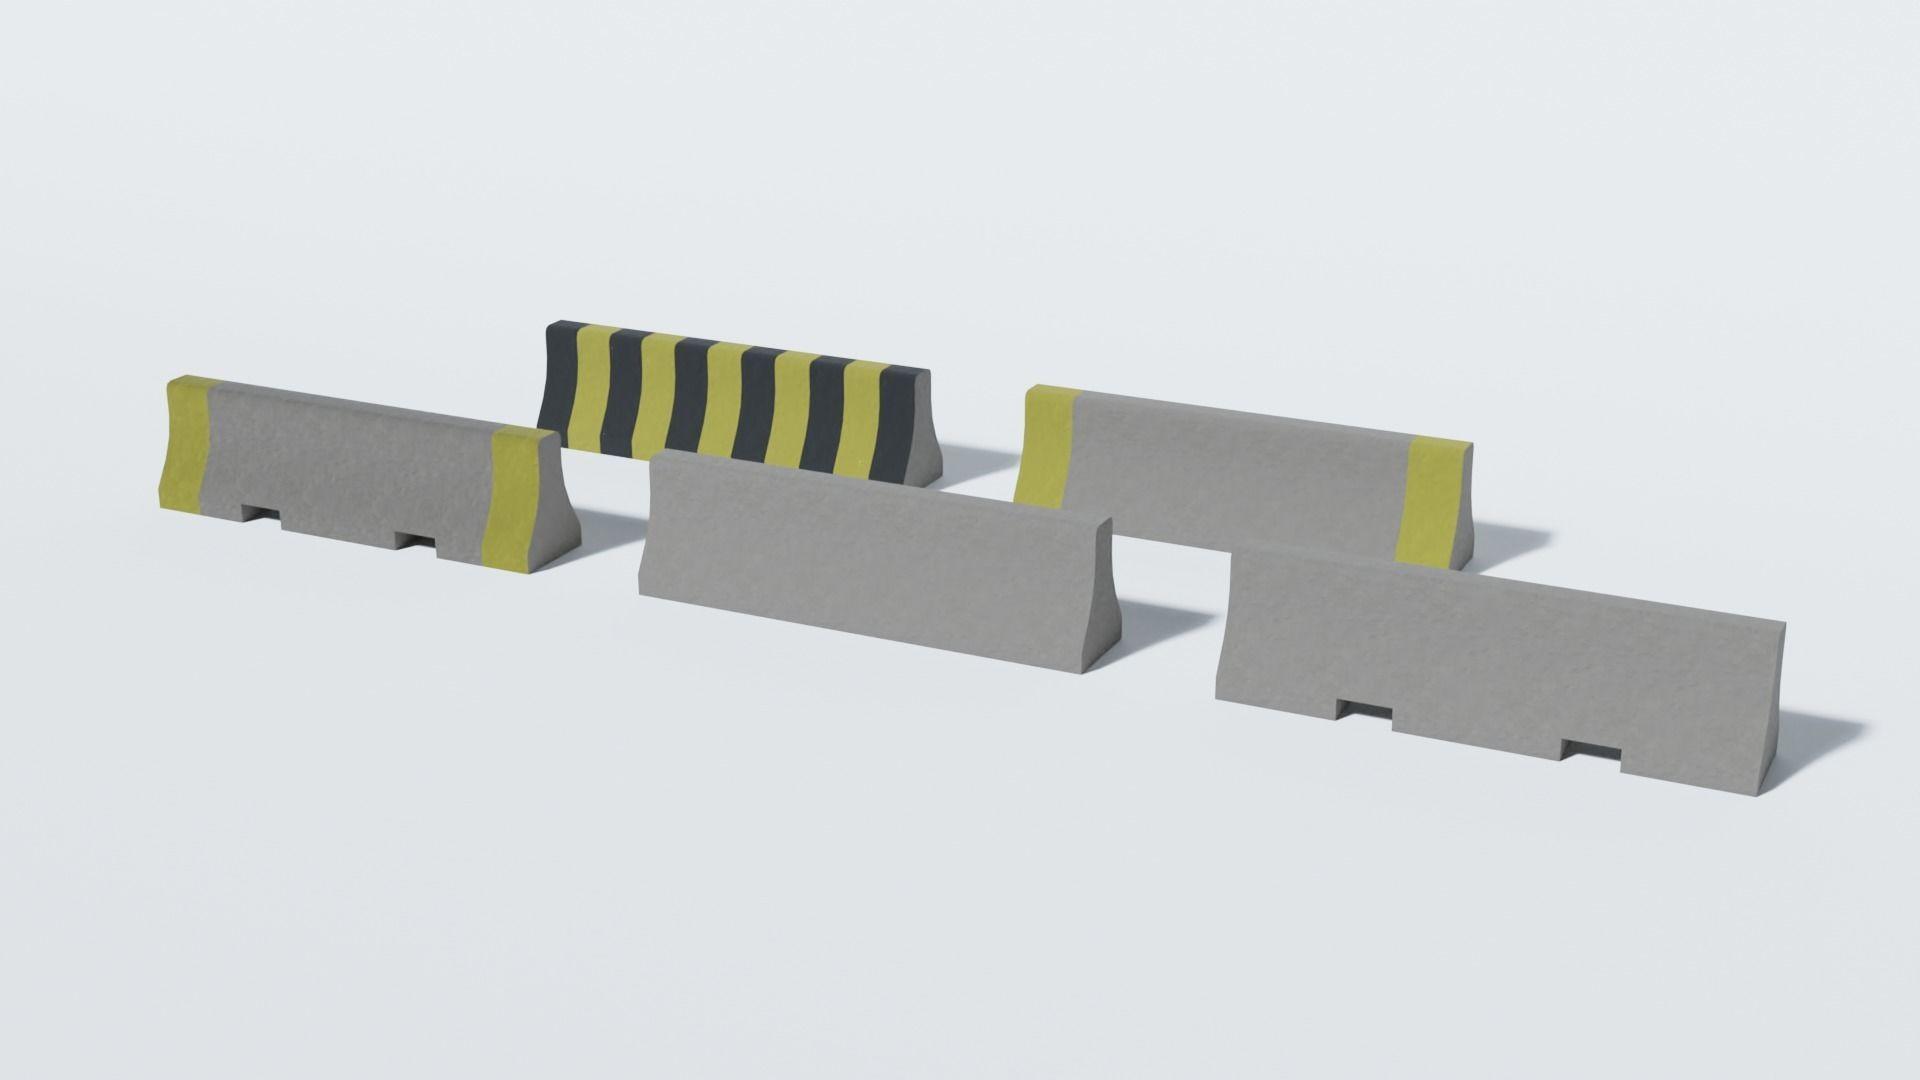 Concrete Barrier Collection